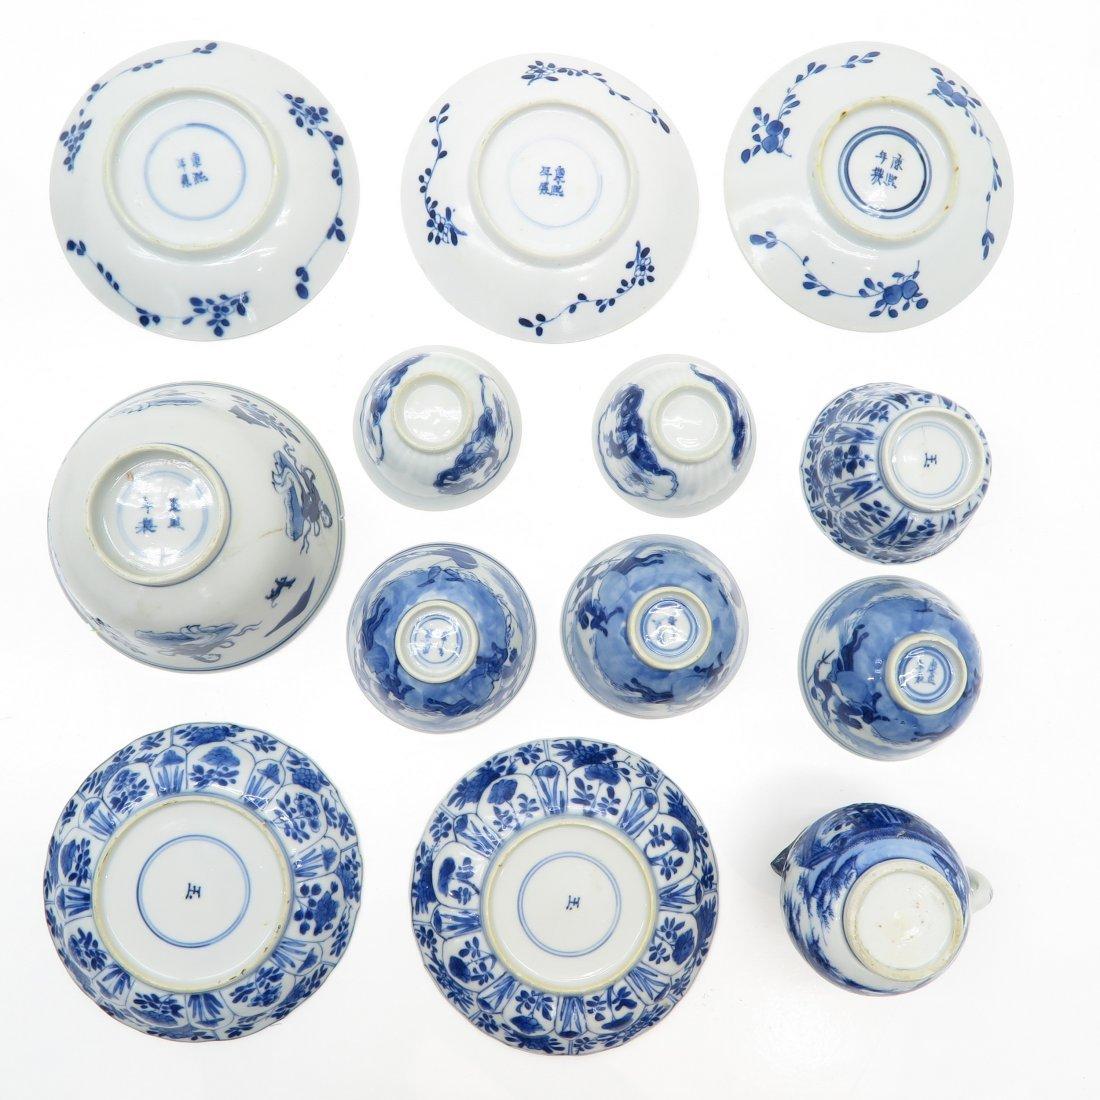 Diverse Lot of China Porcelain - 3